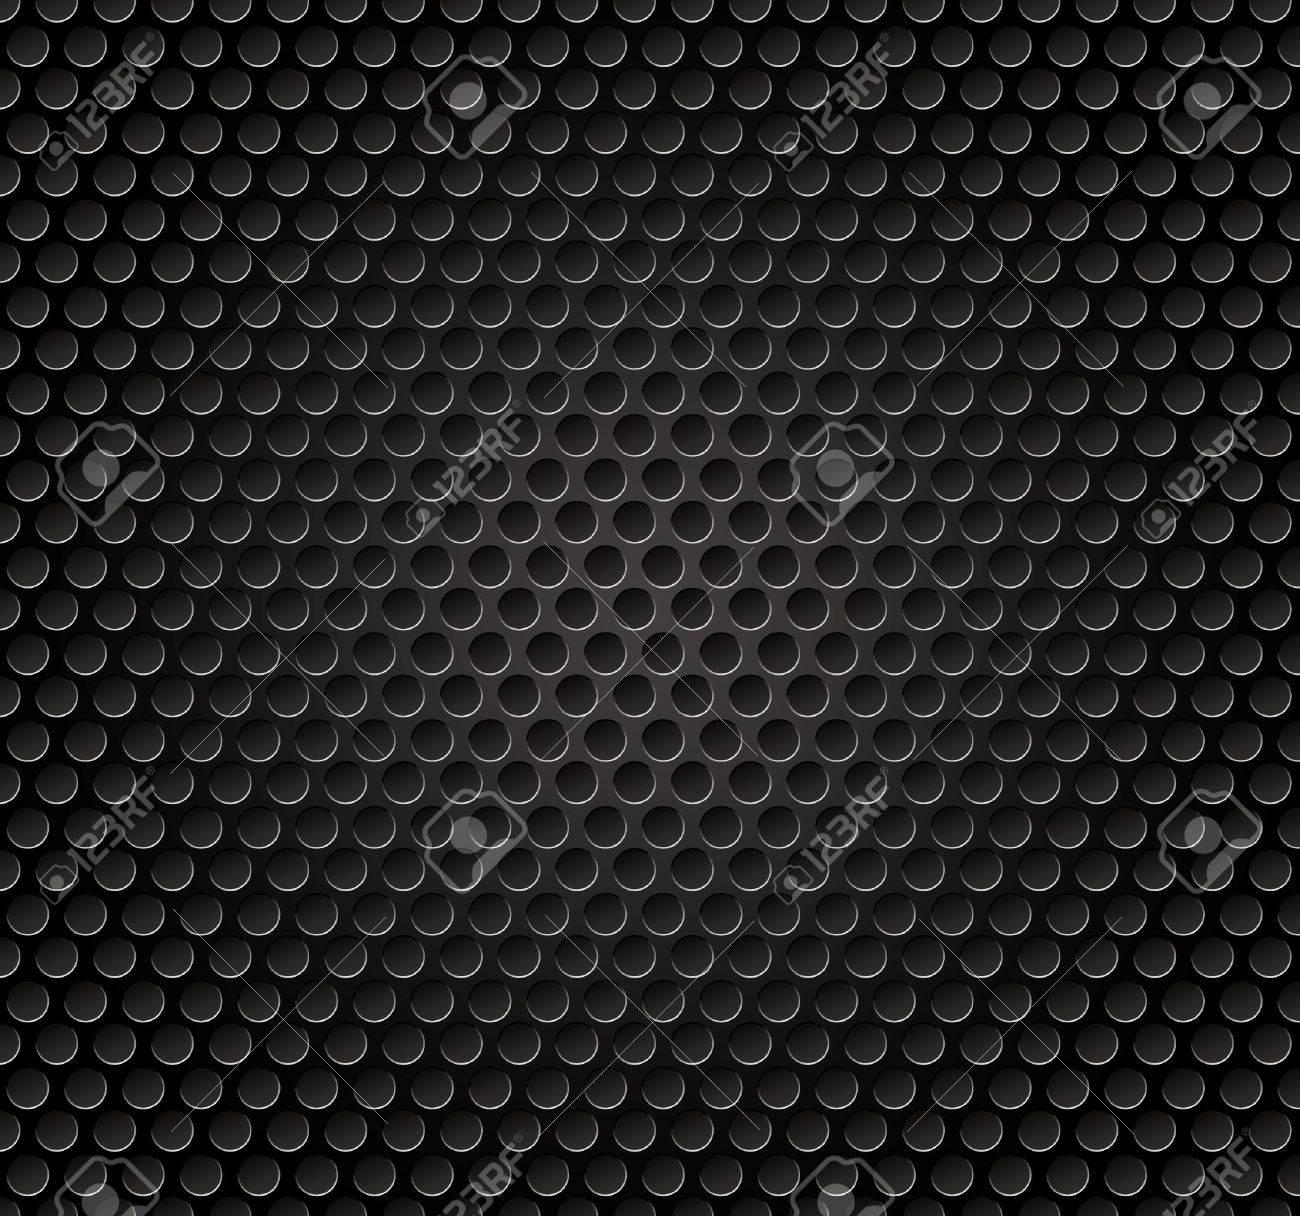 Vector illutration of speaker metal grille. Stock Vector - 9713511